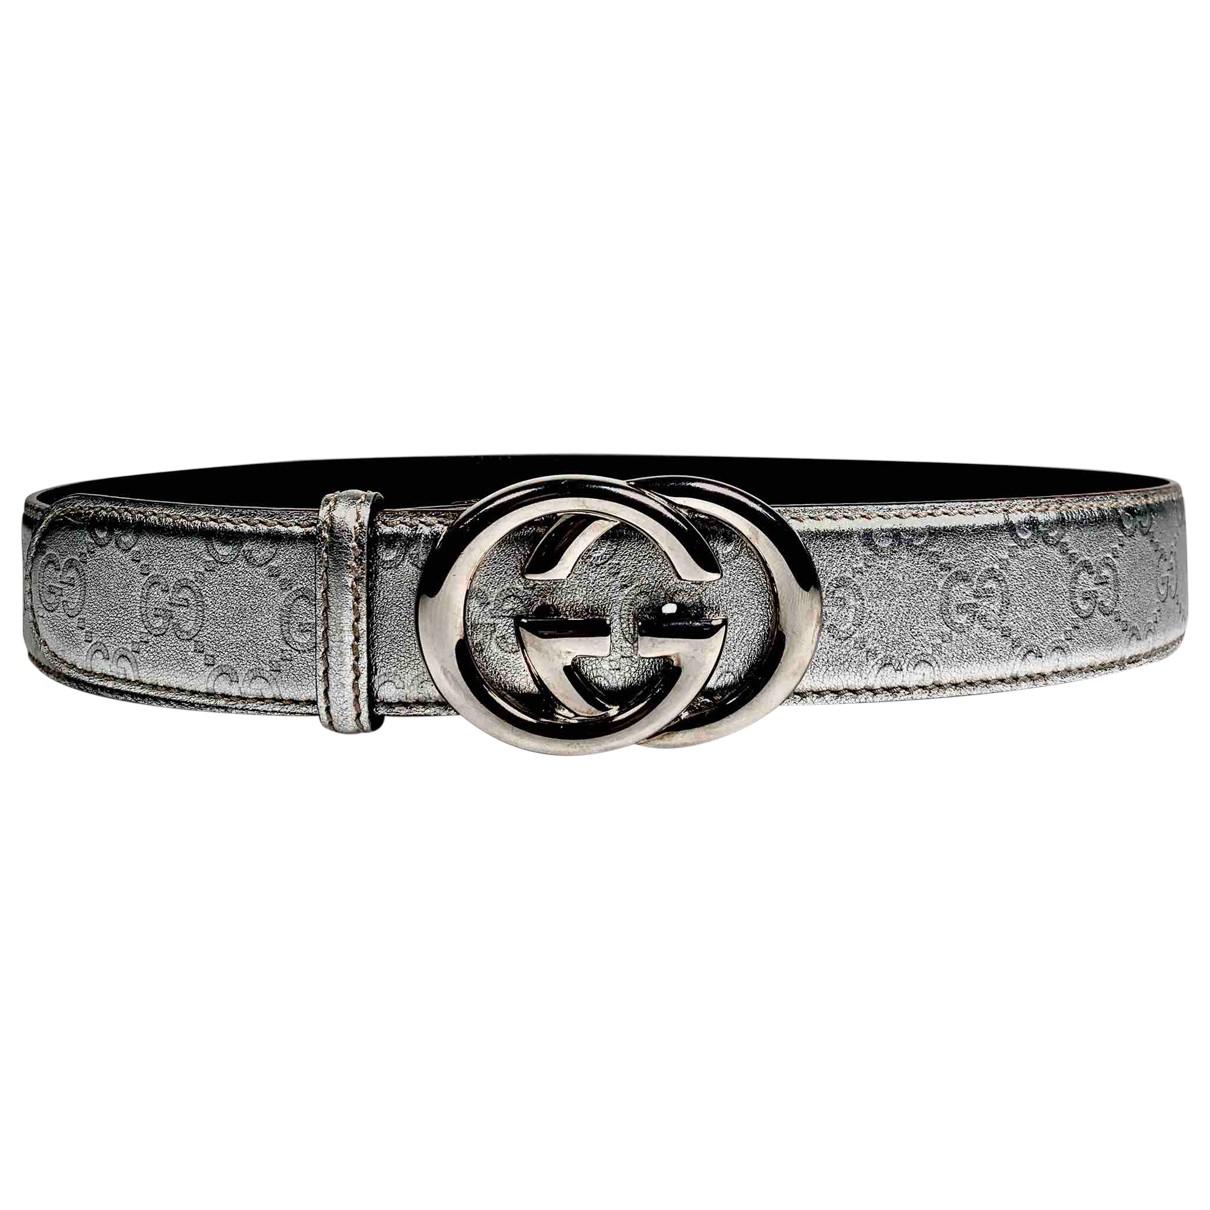 Gucci Interlocking Buckle Silver Leather belt for Women 95 cm